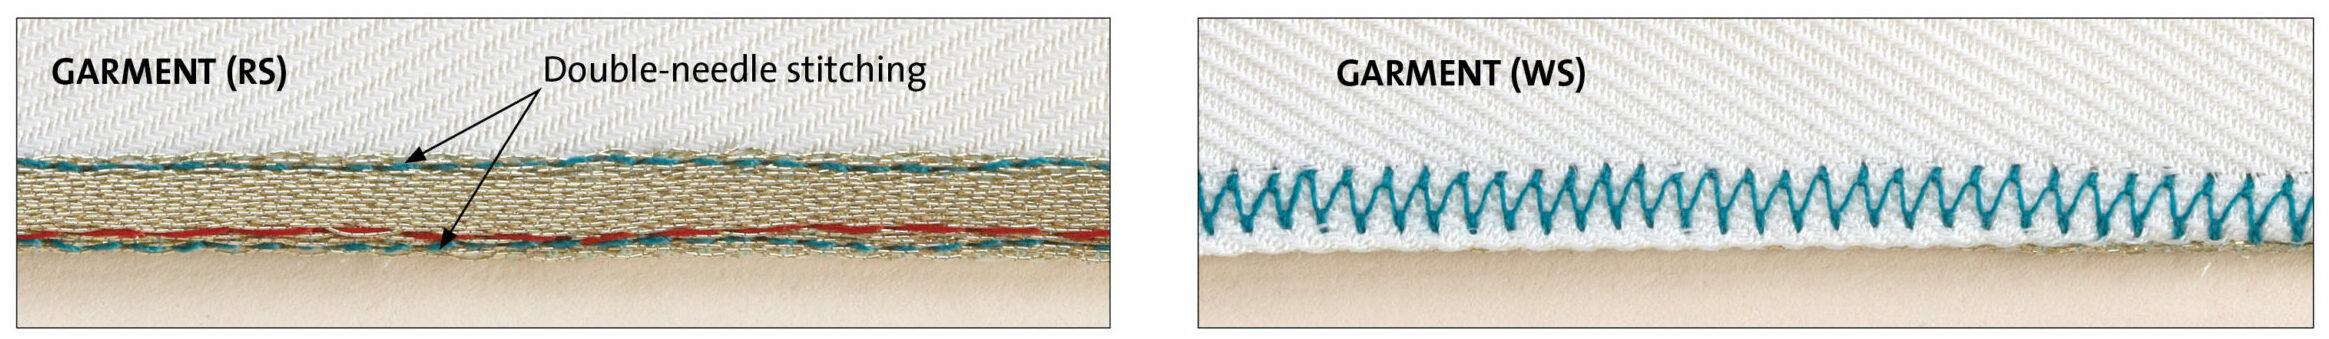 sew the hem of the edges